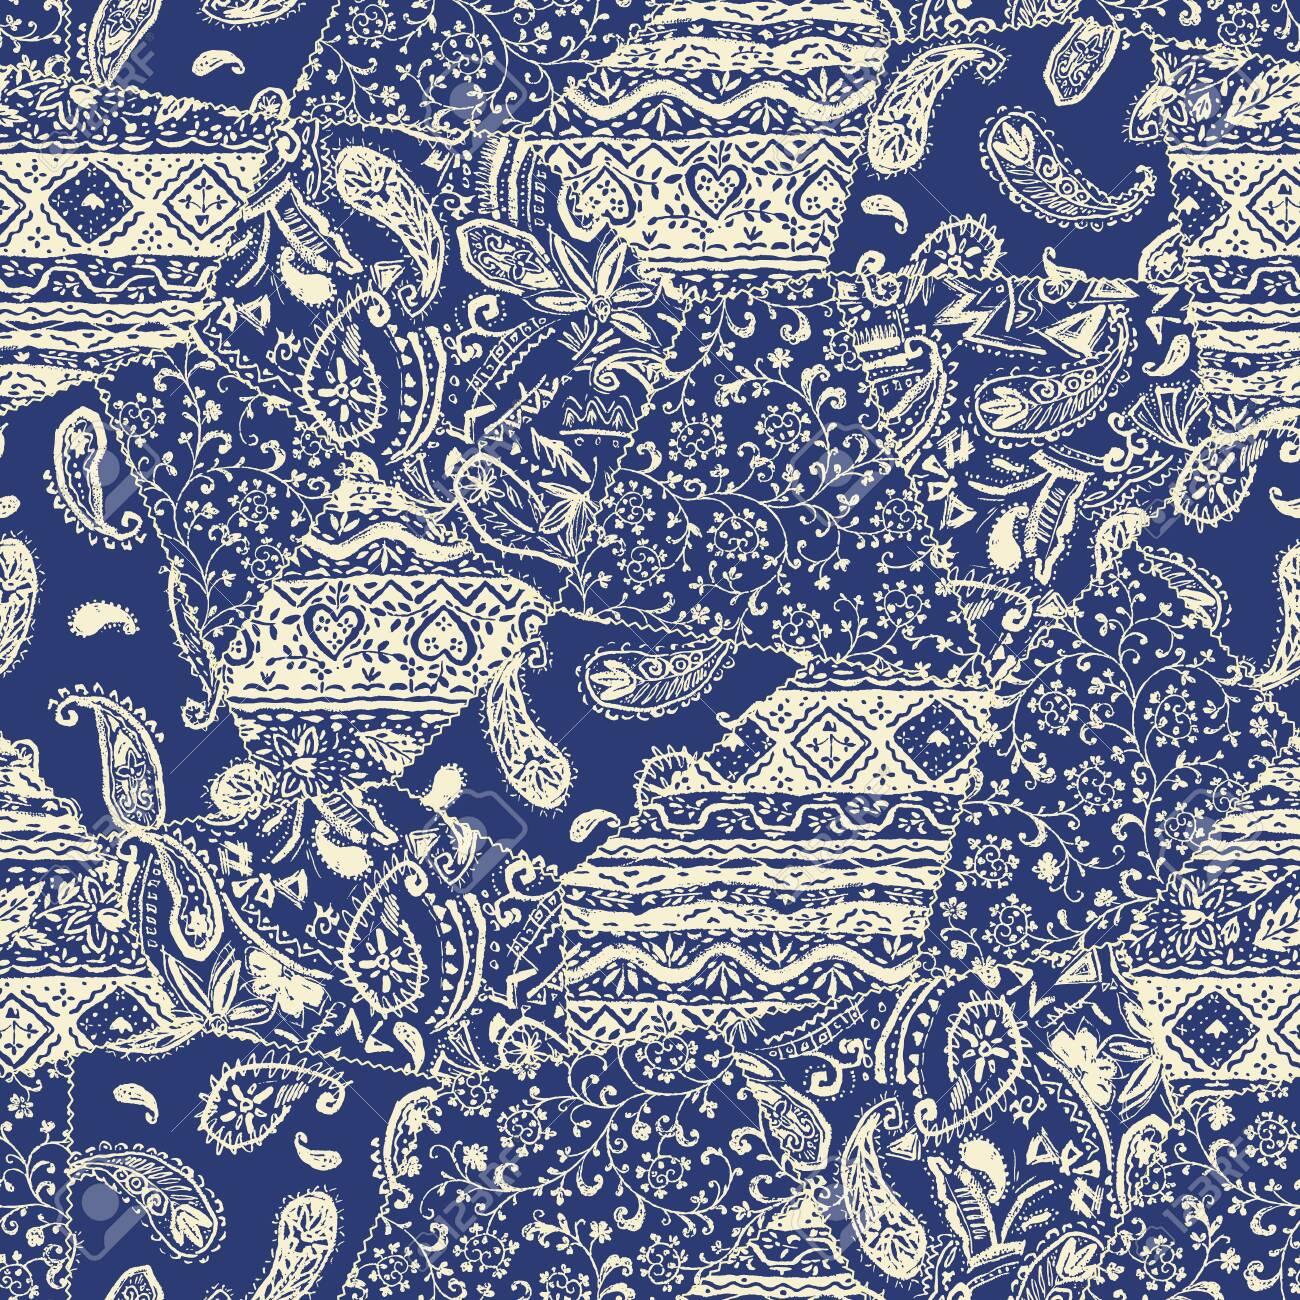 Beautiful chintz design patchwork pattern material, - 131470169